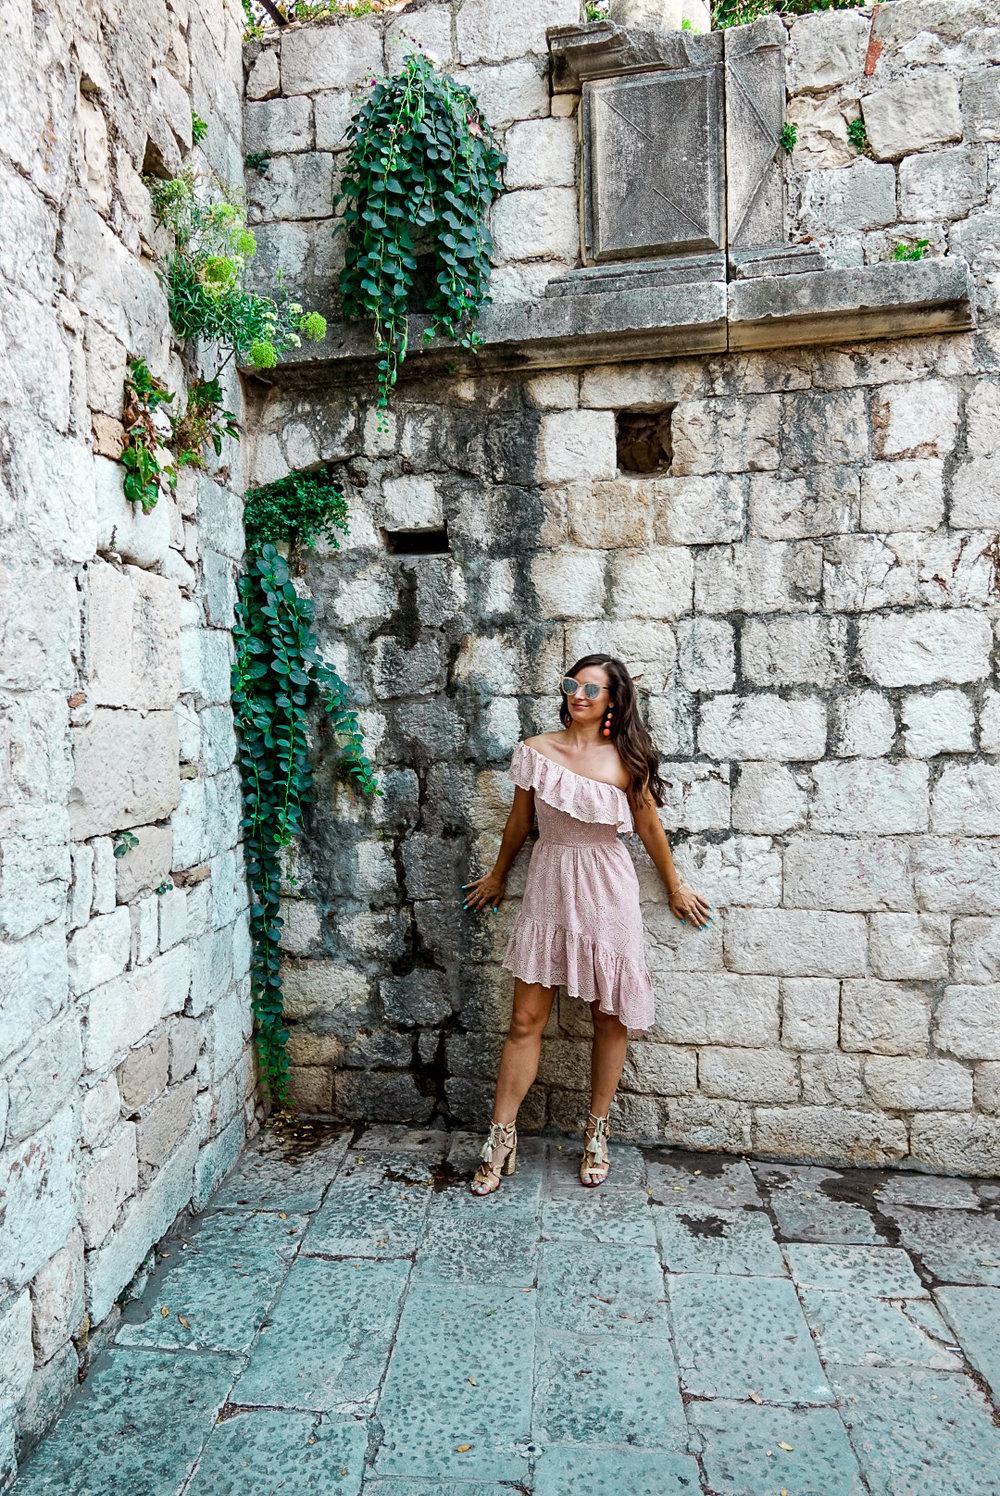 Dubrovnik19.jpg